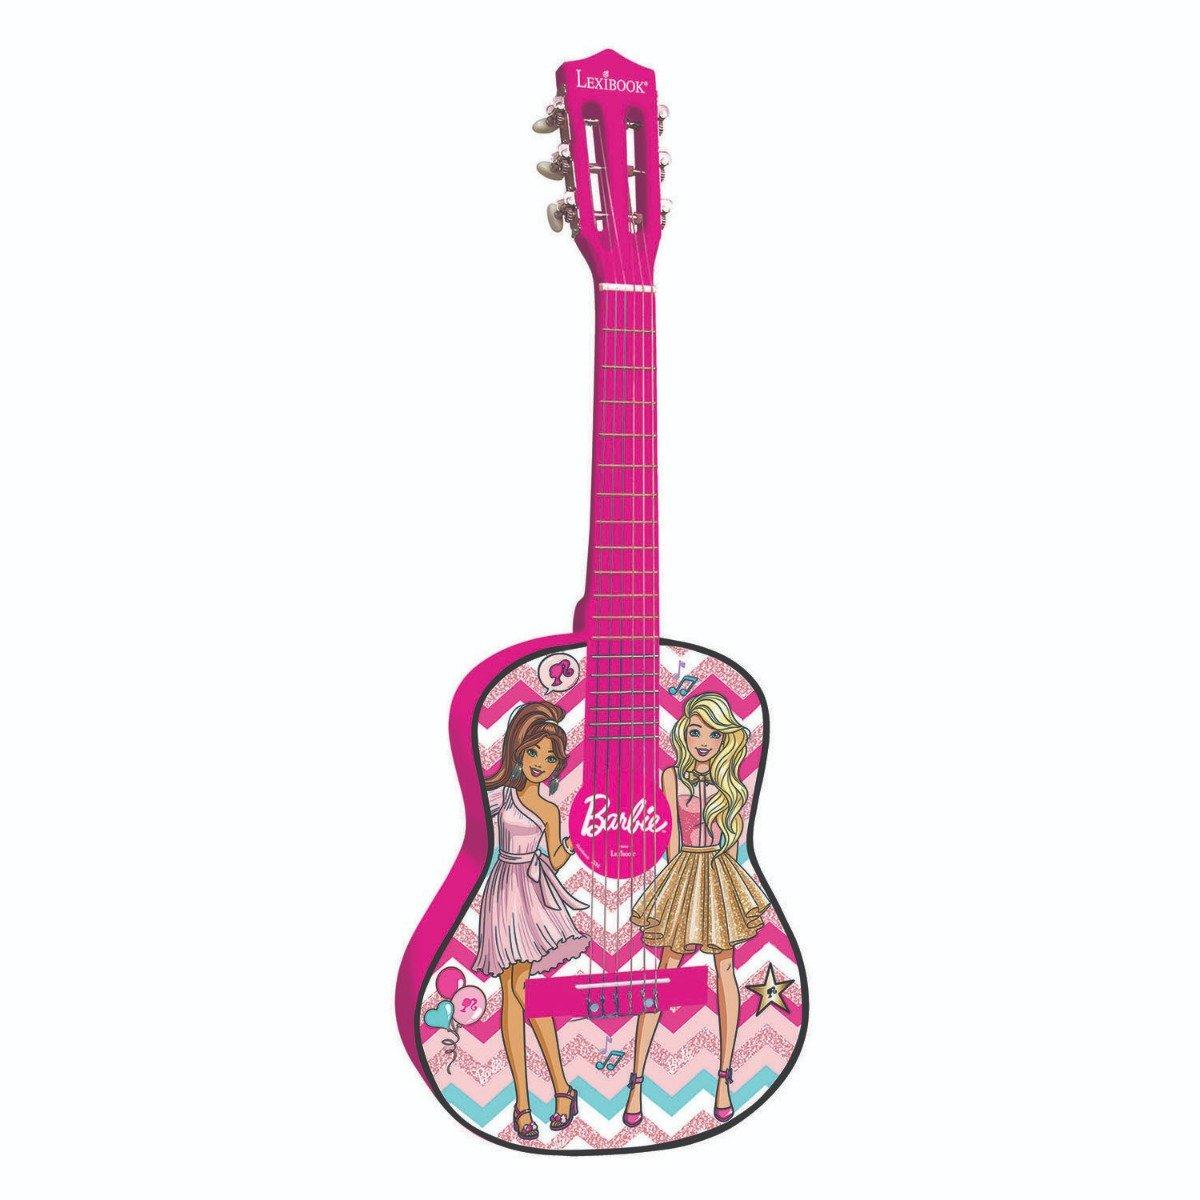 Chitara acustica de lemn Rock's Royals Barbie, 78 cm